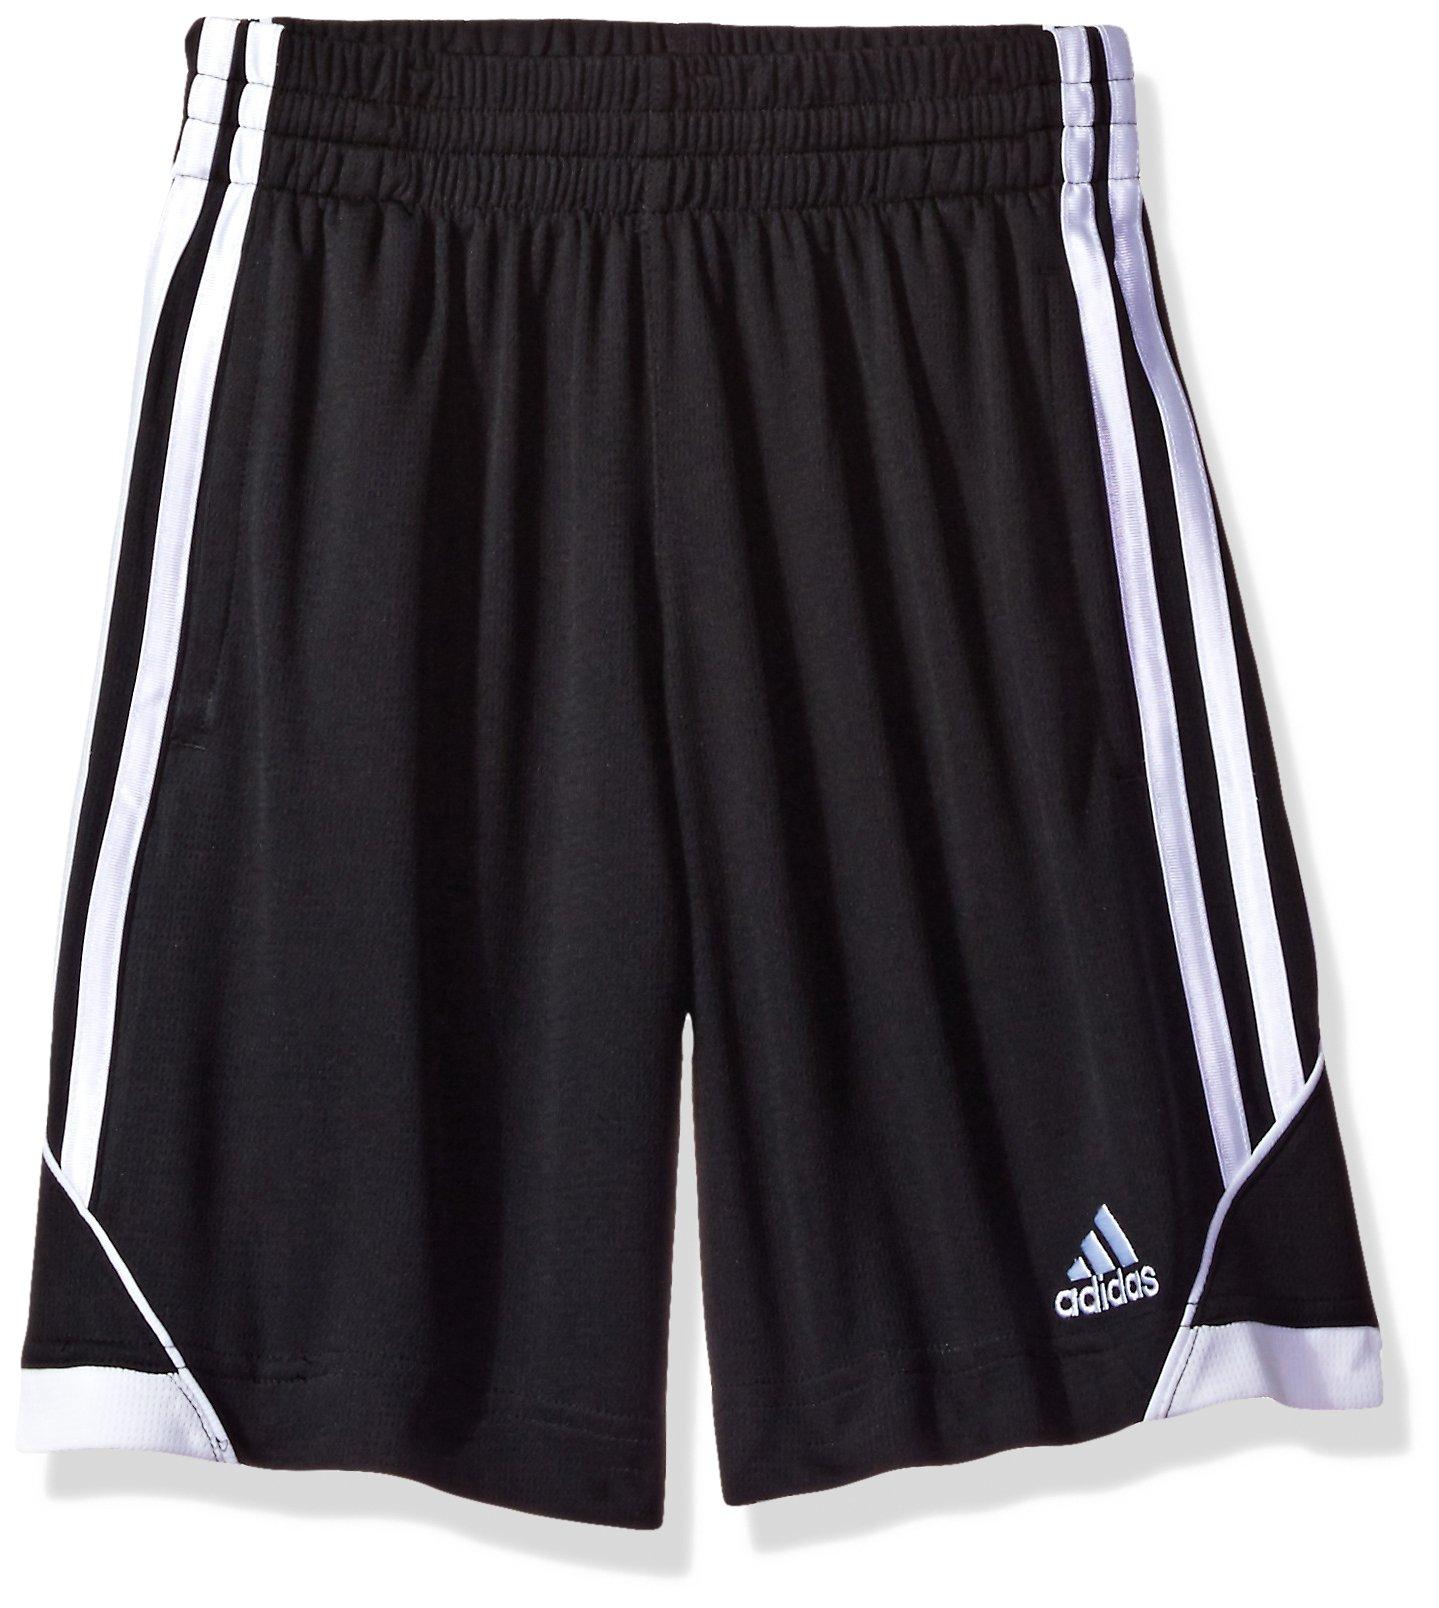 Adidas Boys' Little Athletic Short, Caviar Black, 7